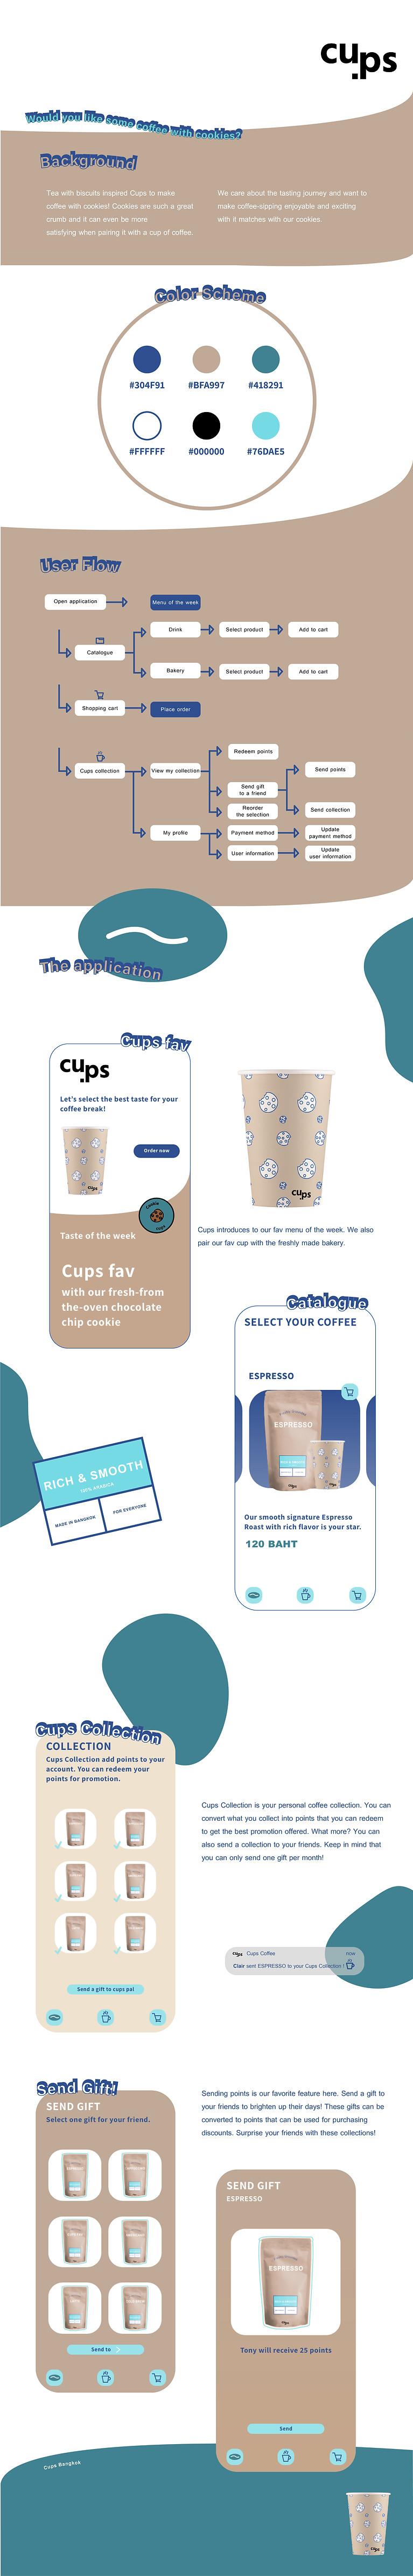 main_cups 2.jpg